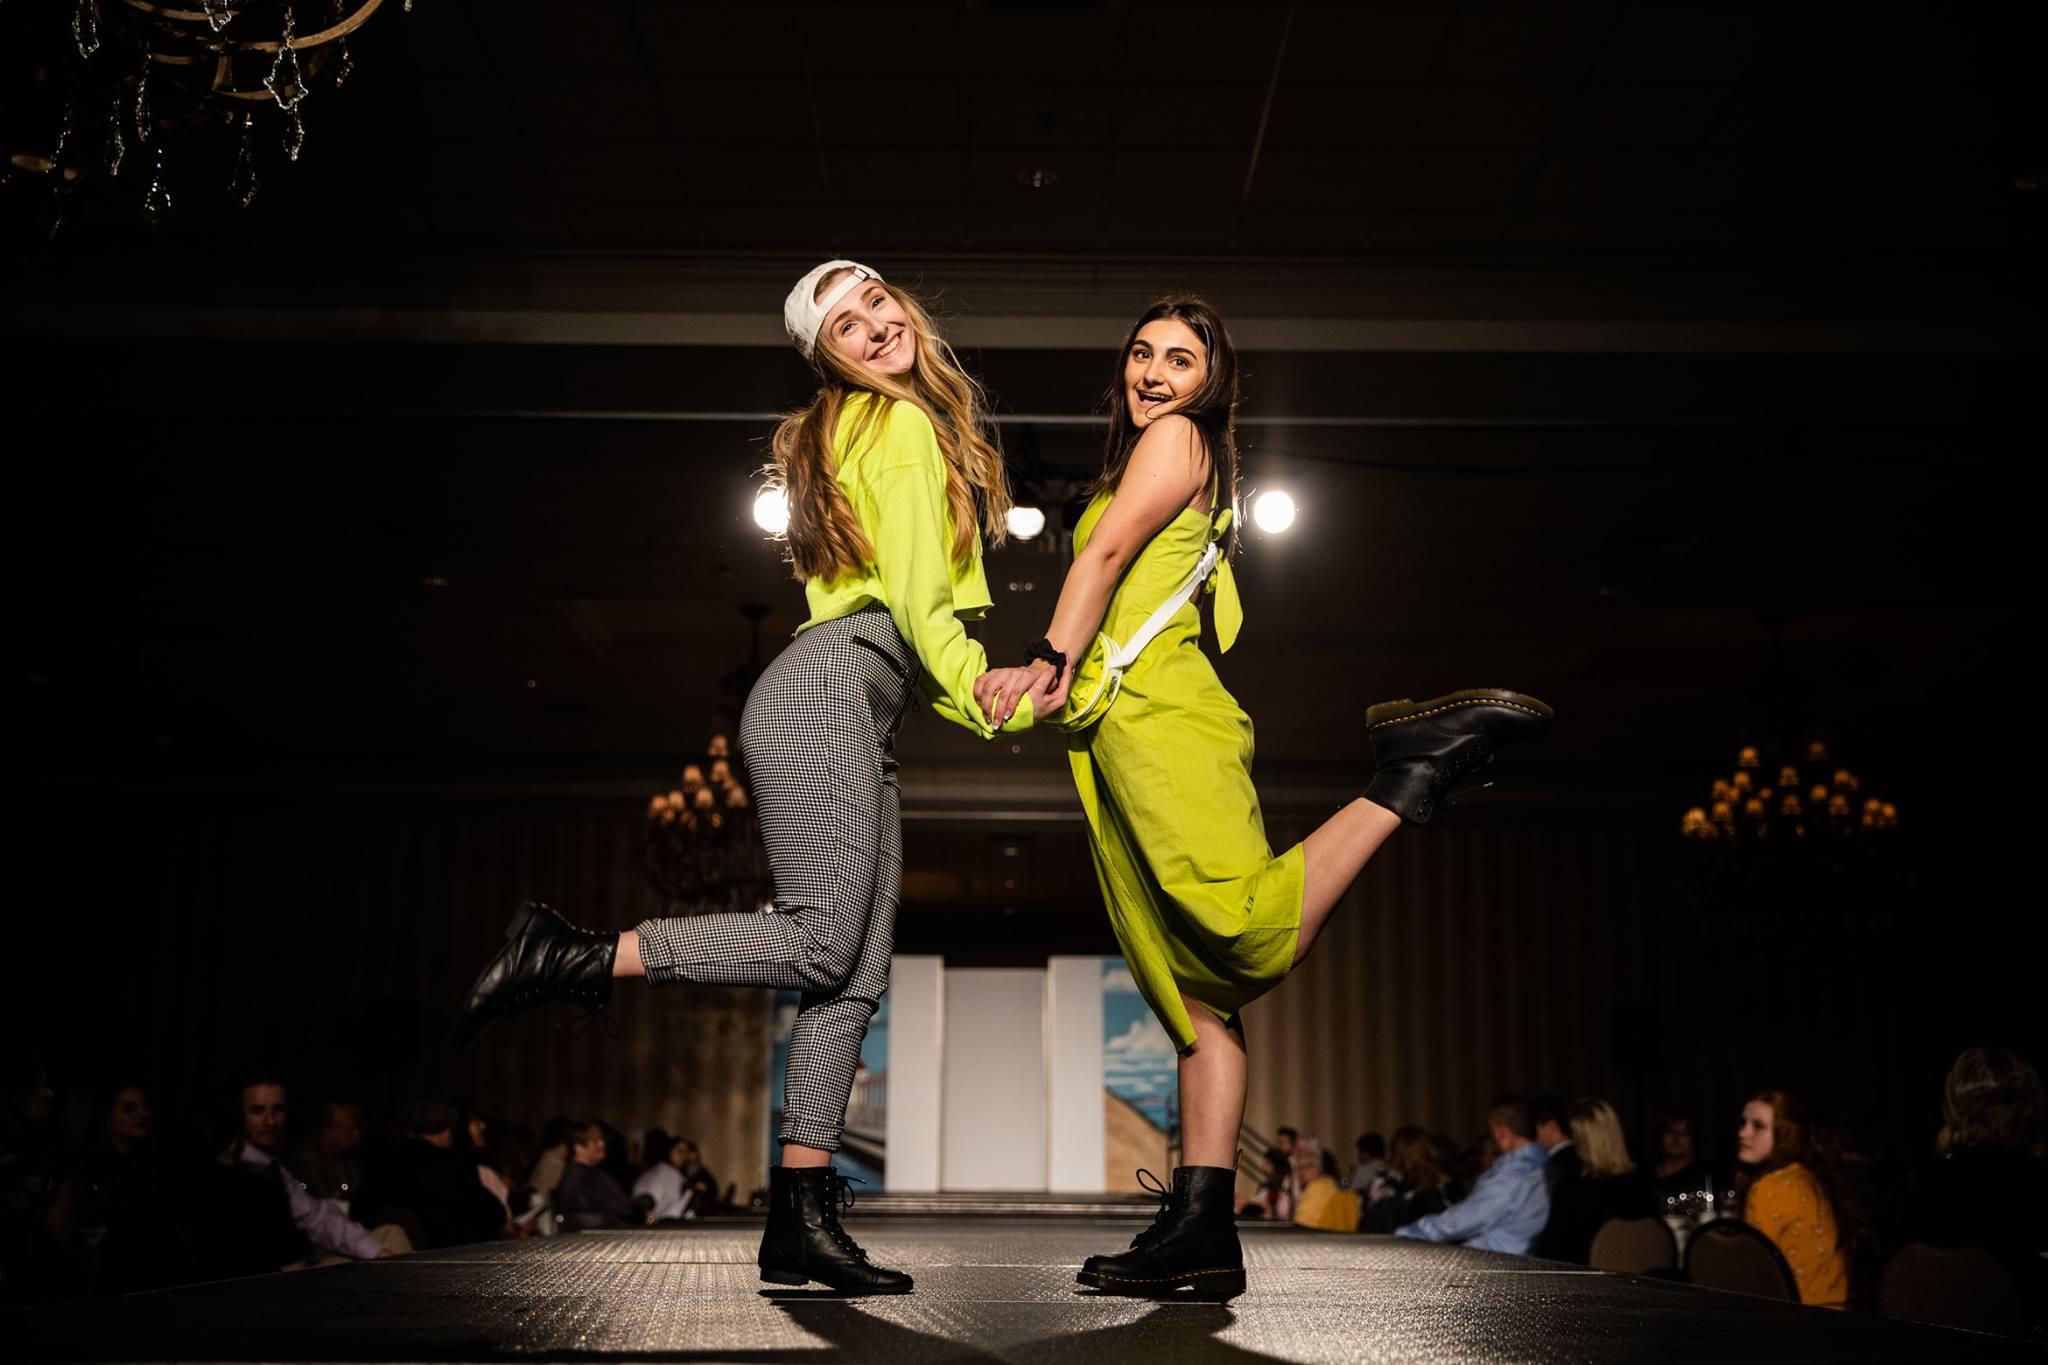 Lutheran_North_High_School_Macomb_Michigan_LHN_Fashion_Show_2019 (13).jpg